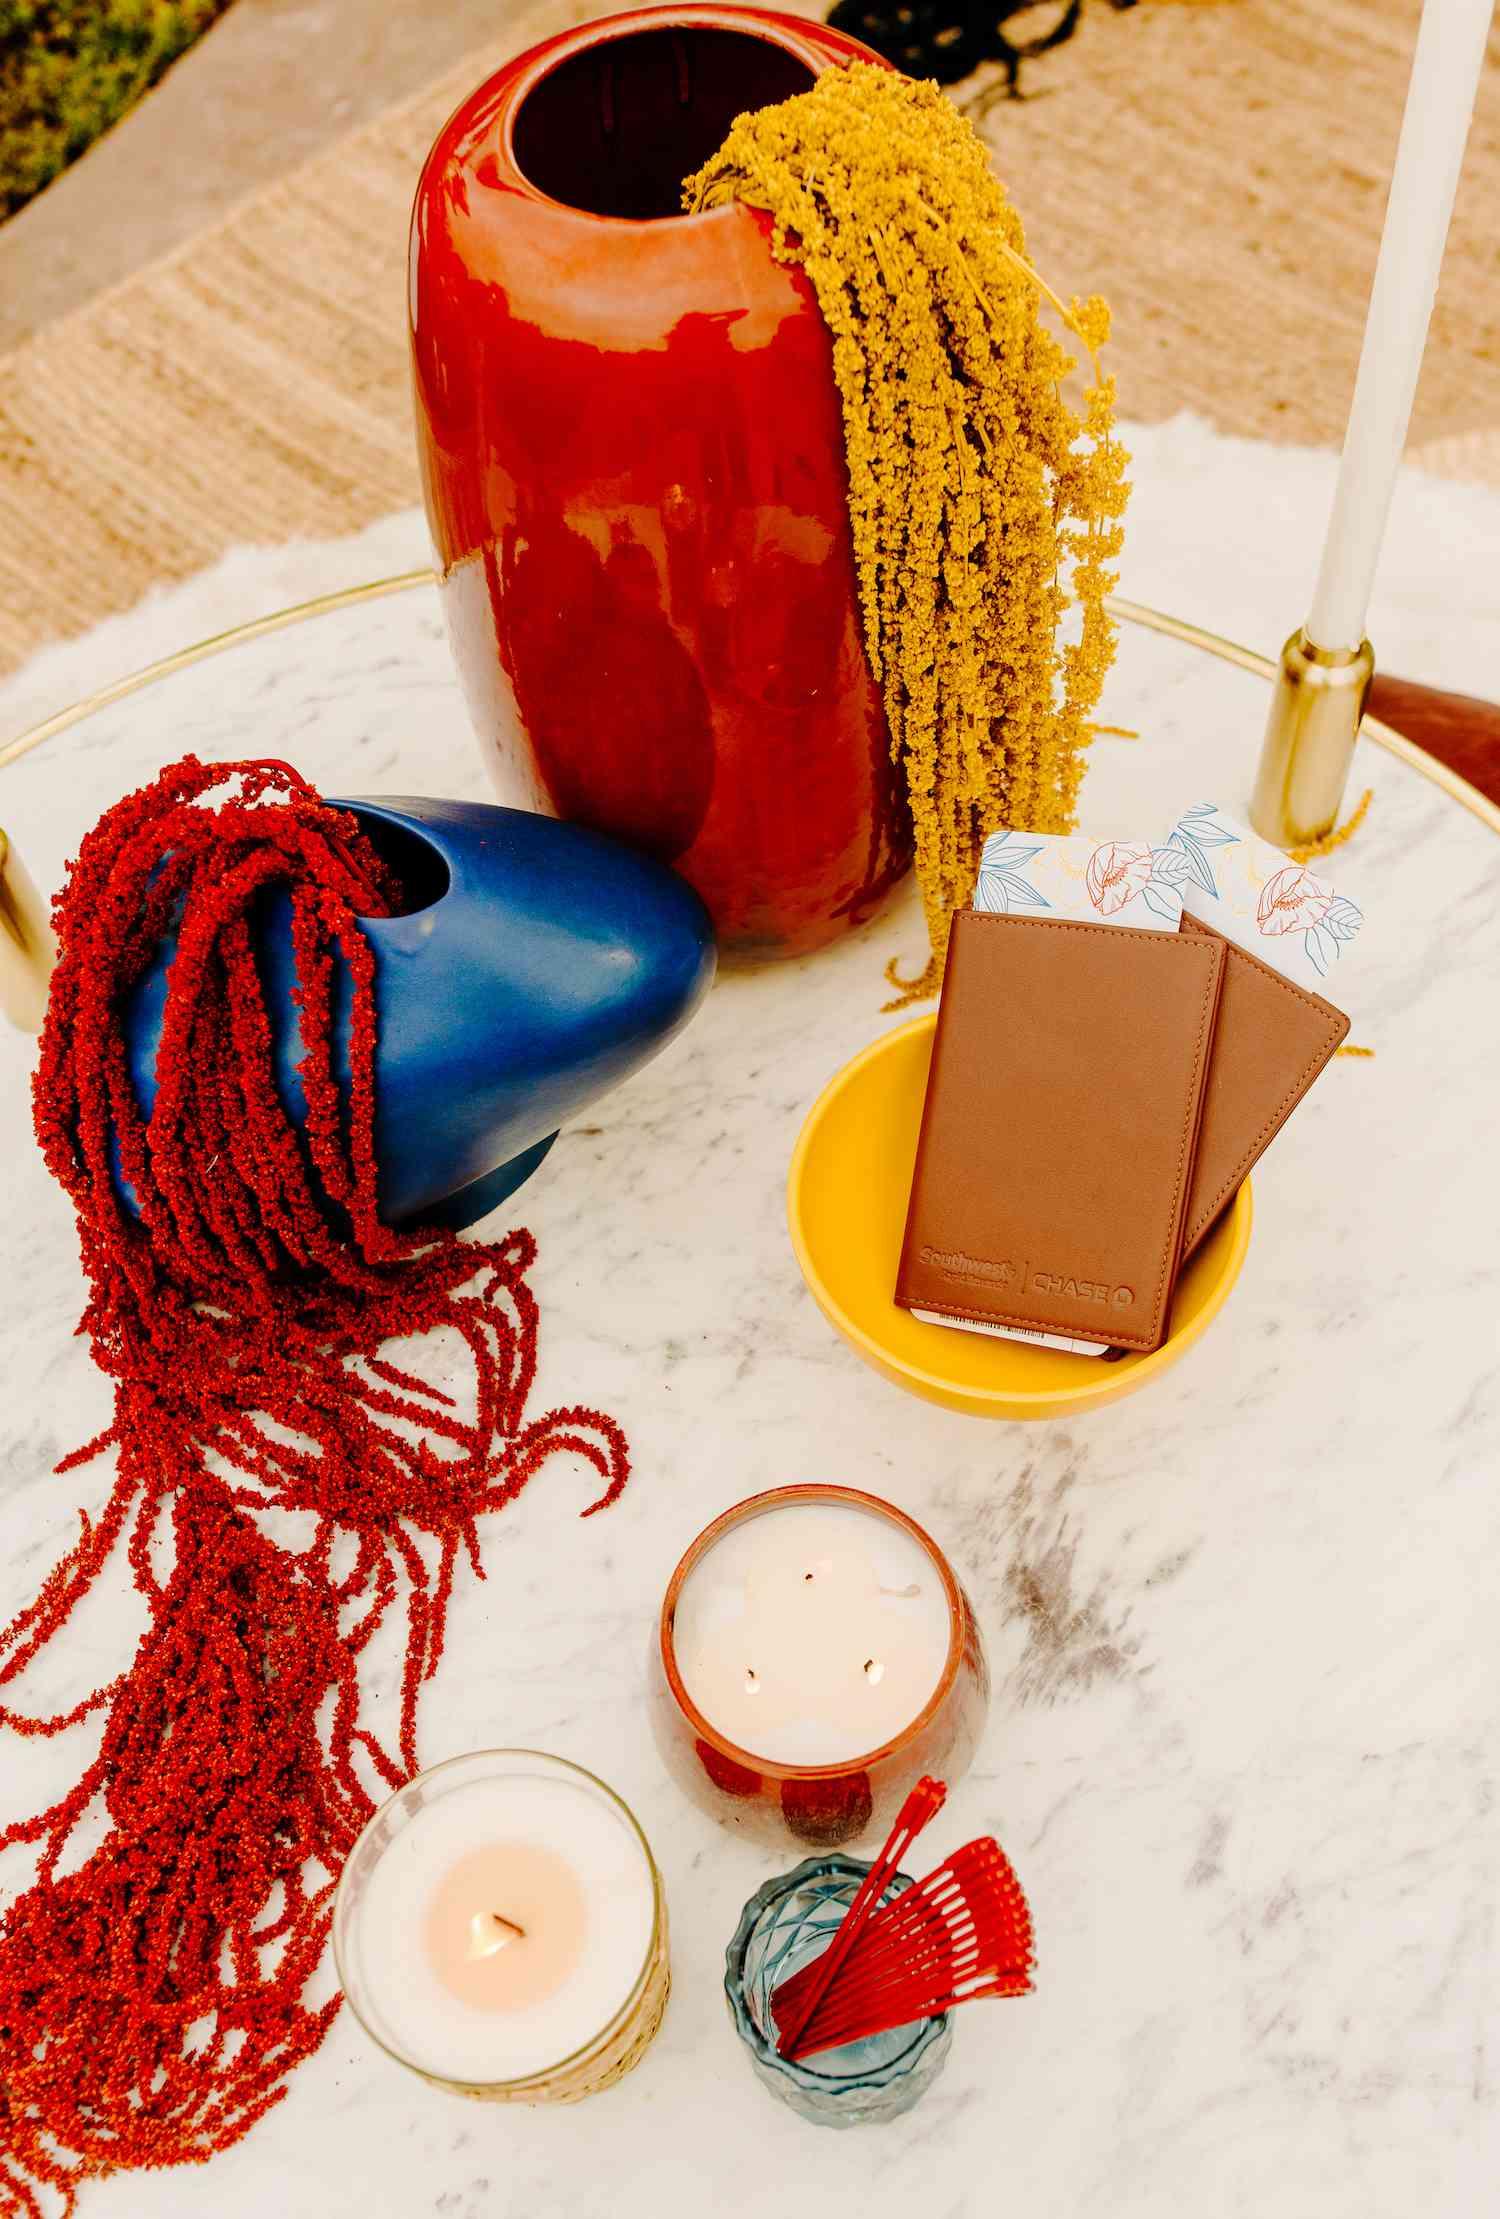 Backyard honeymoon set up, featuring Chase Southwest Rapid Rewards Credit Card® vouchers